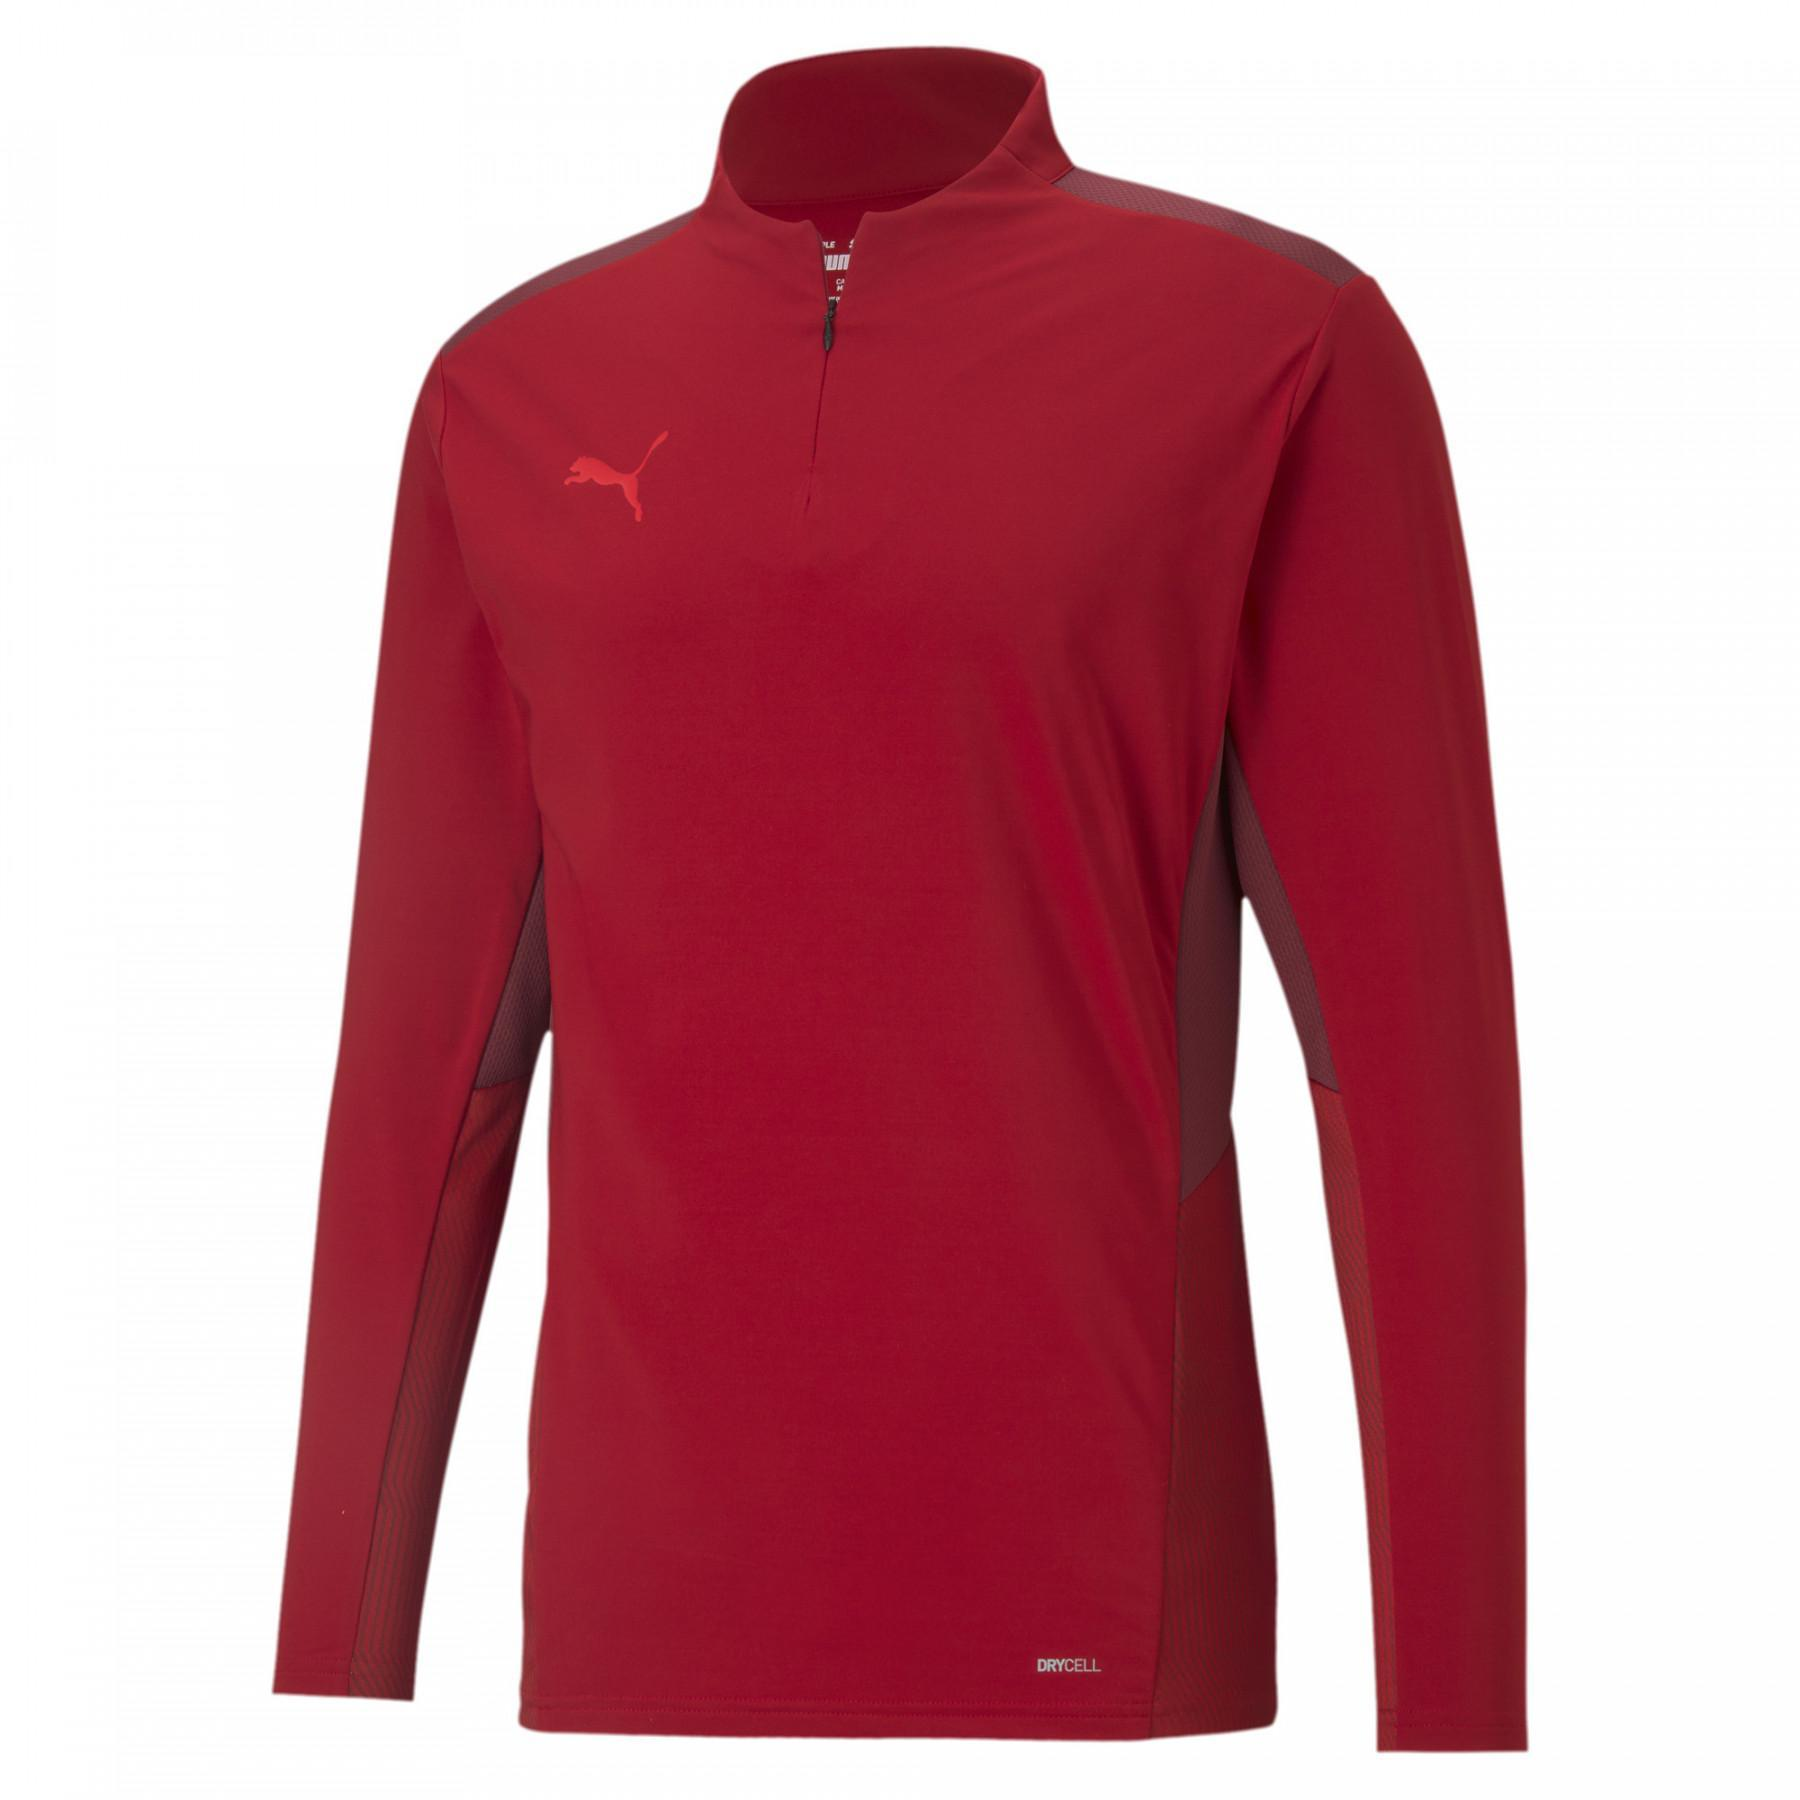 Puma TeamCup 1/4 zip sweatshirt